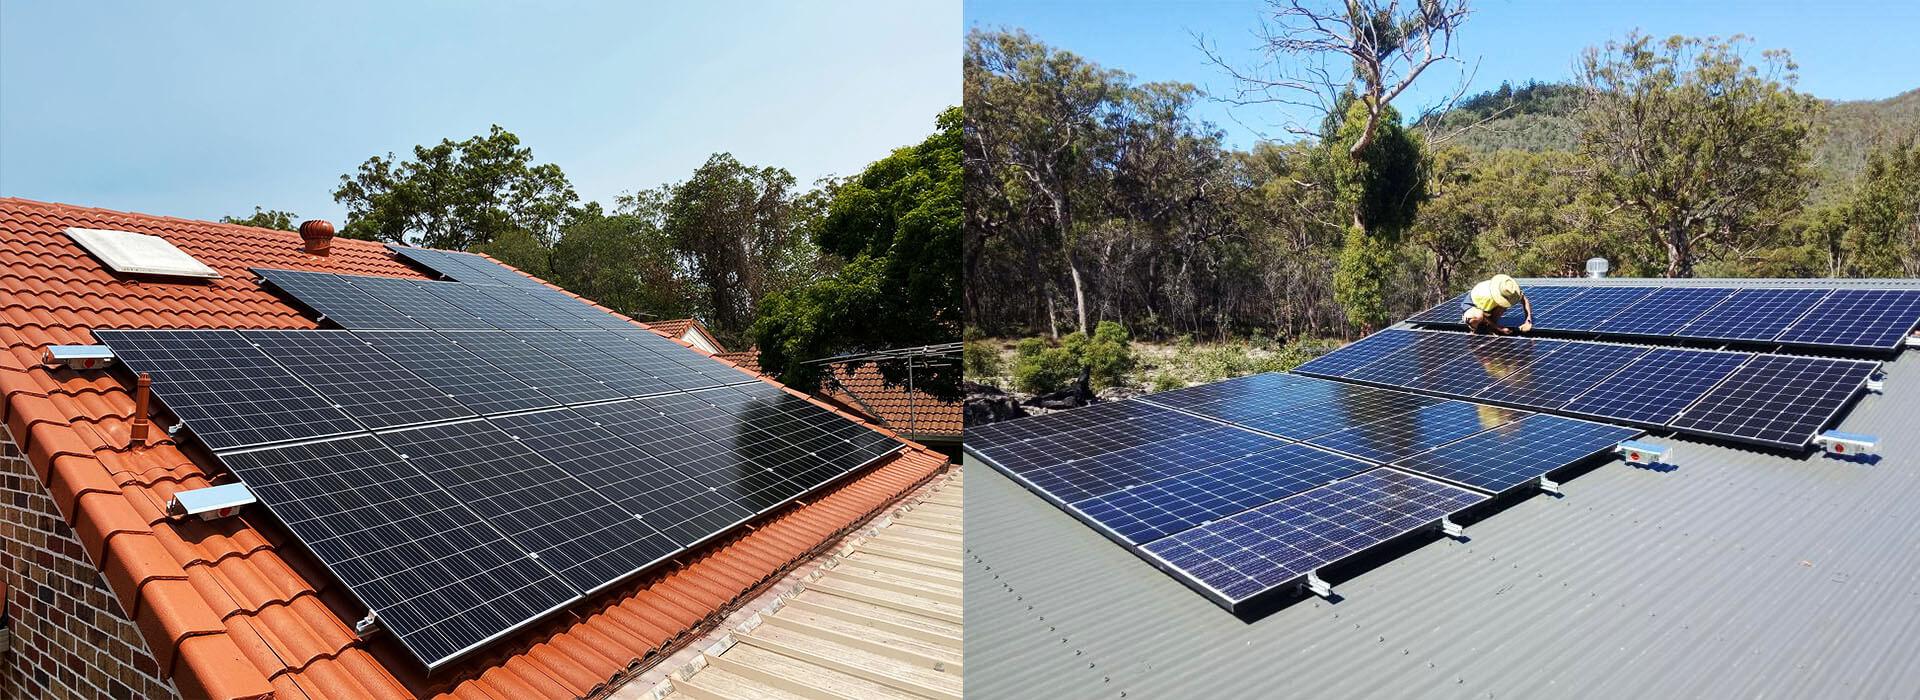 Home solar system installations